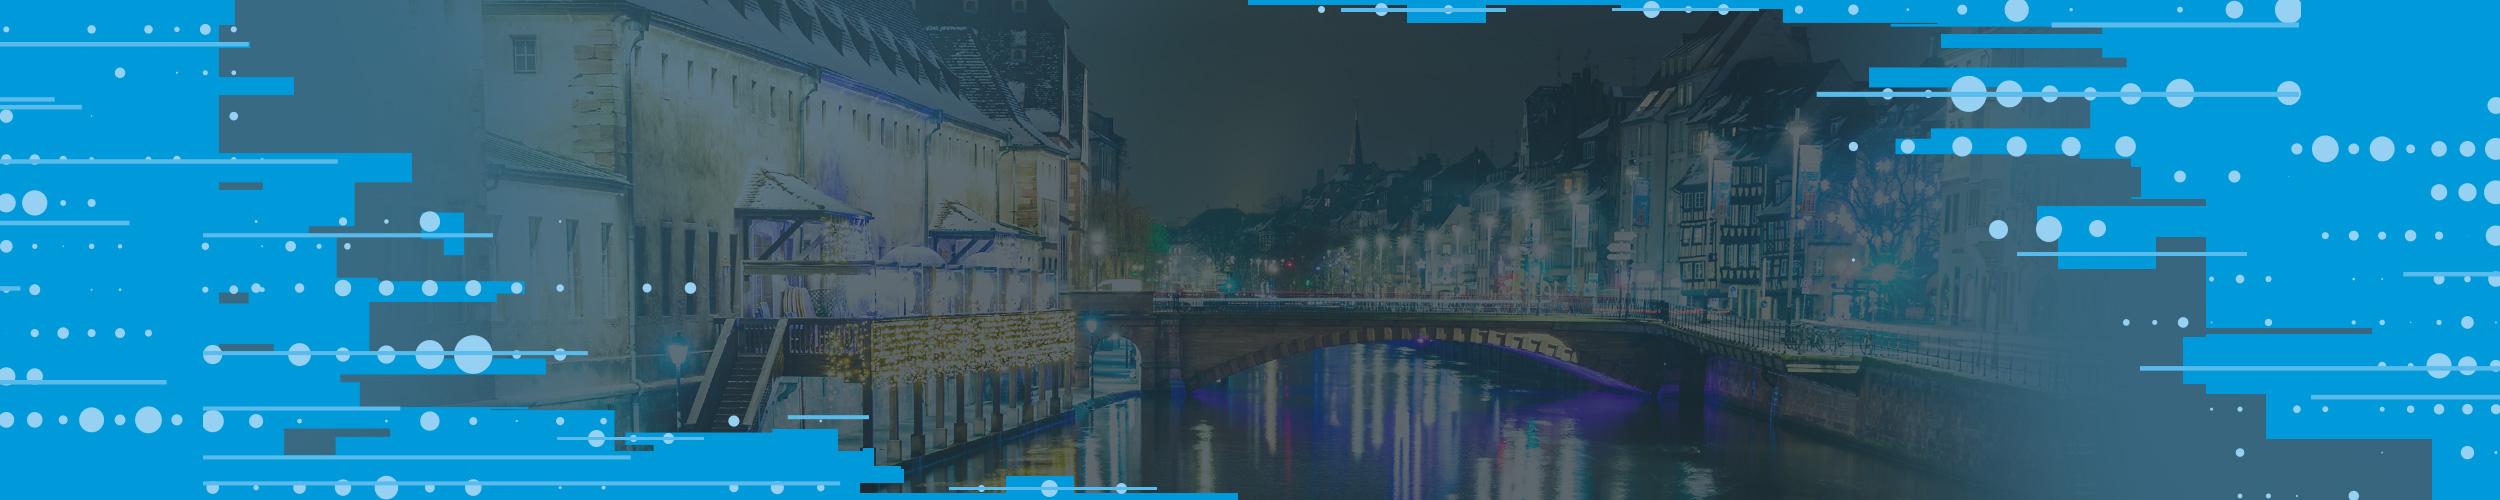 SPIE Photonics Europe 2022 Strasbourg France